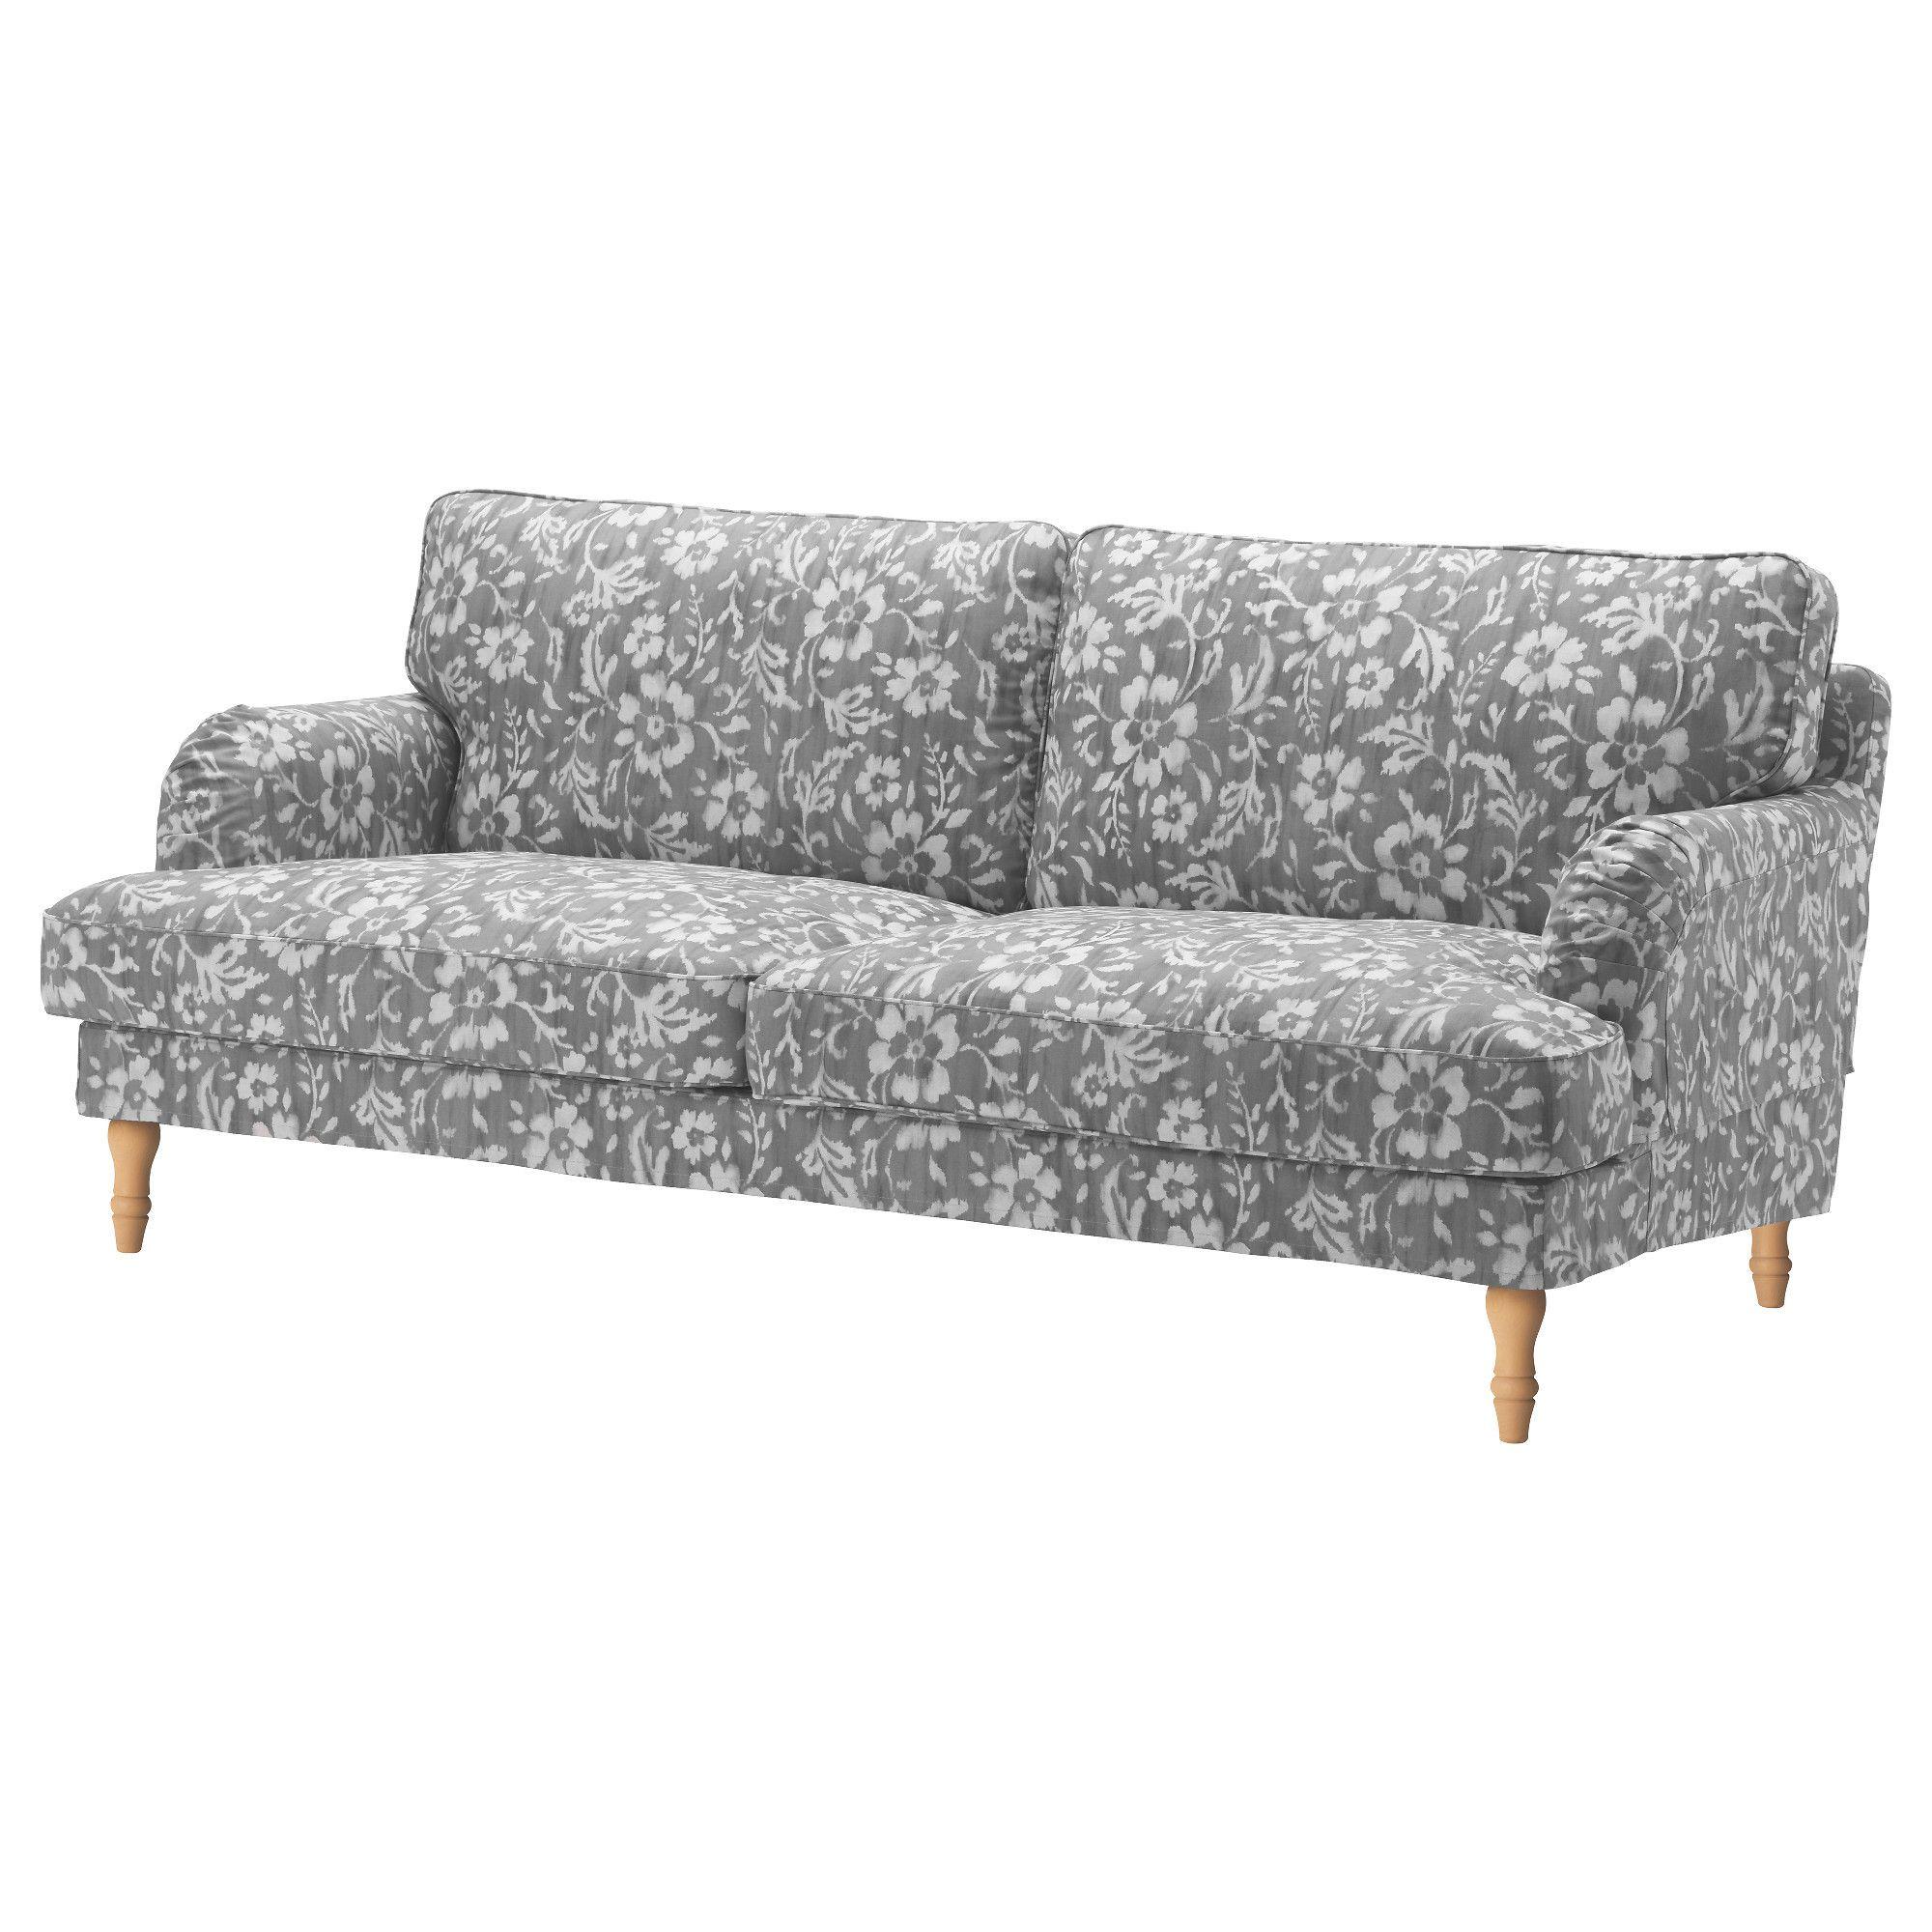 ikea outdoor sofa new couch bett ikea ebenfalls herrlich stocksund 3er sofa hovsten grau of ikea outdoor sofa